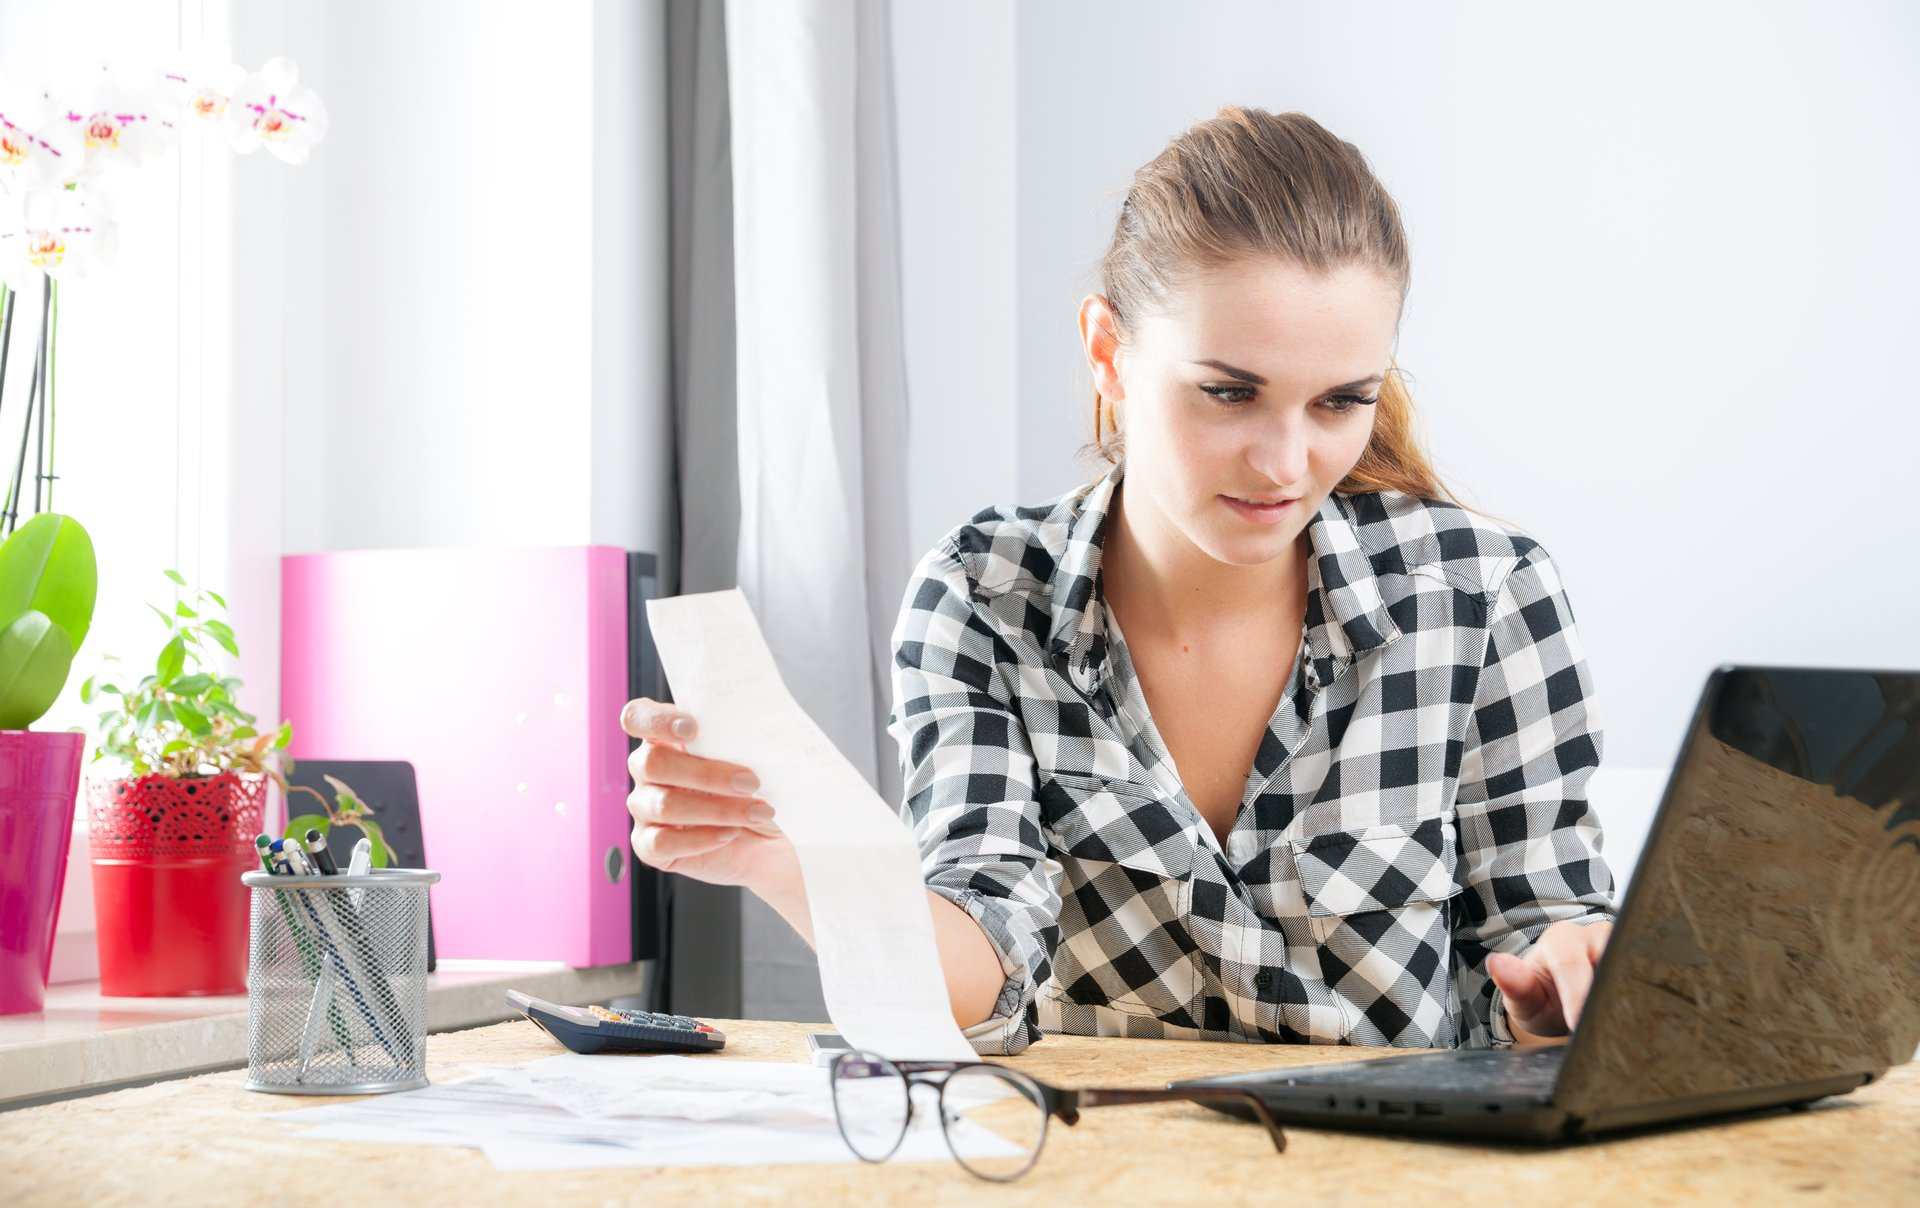 Woman looking at her debts